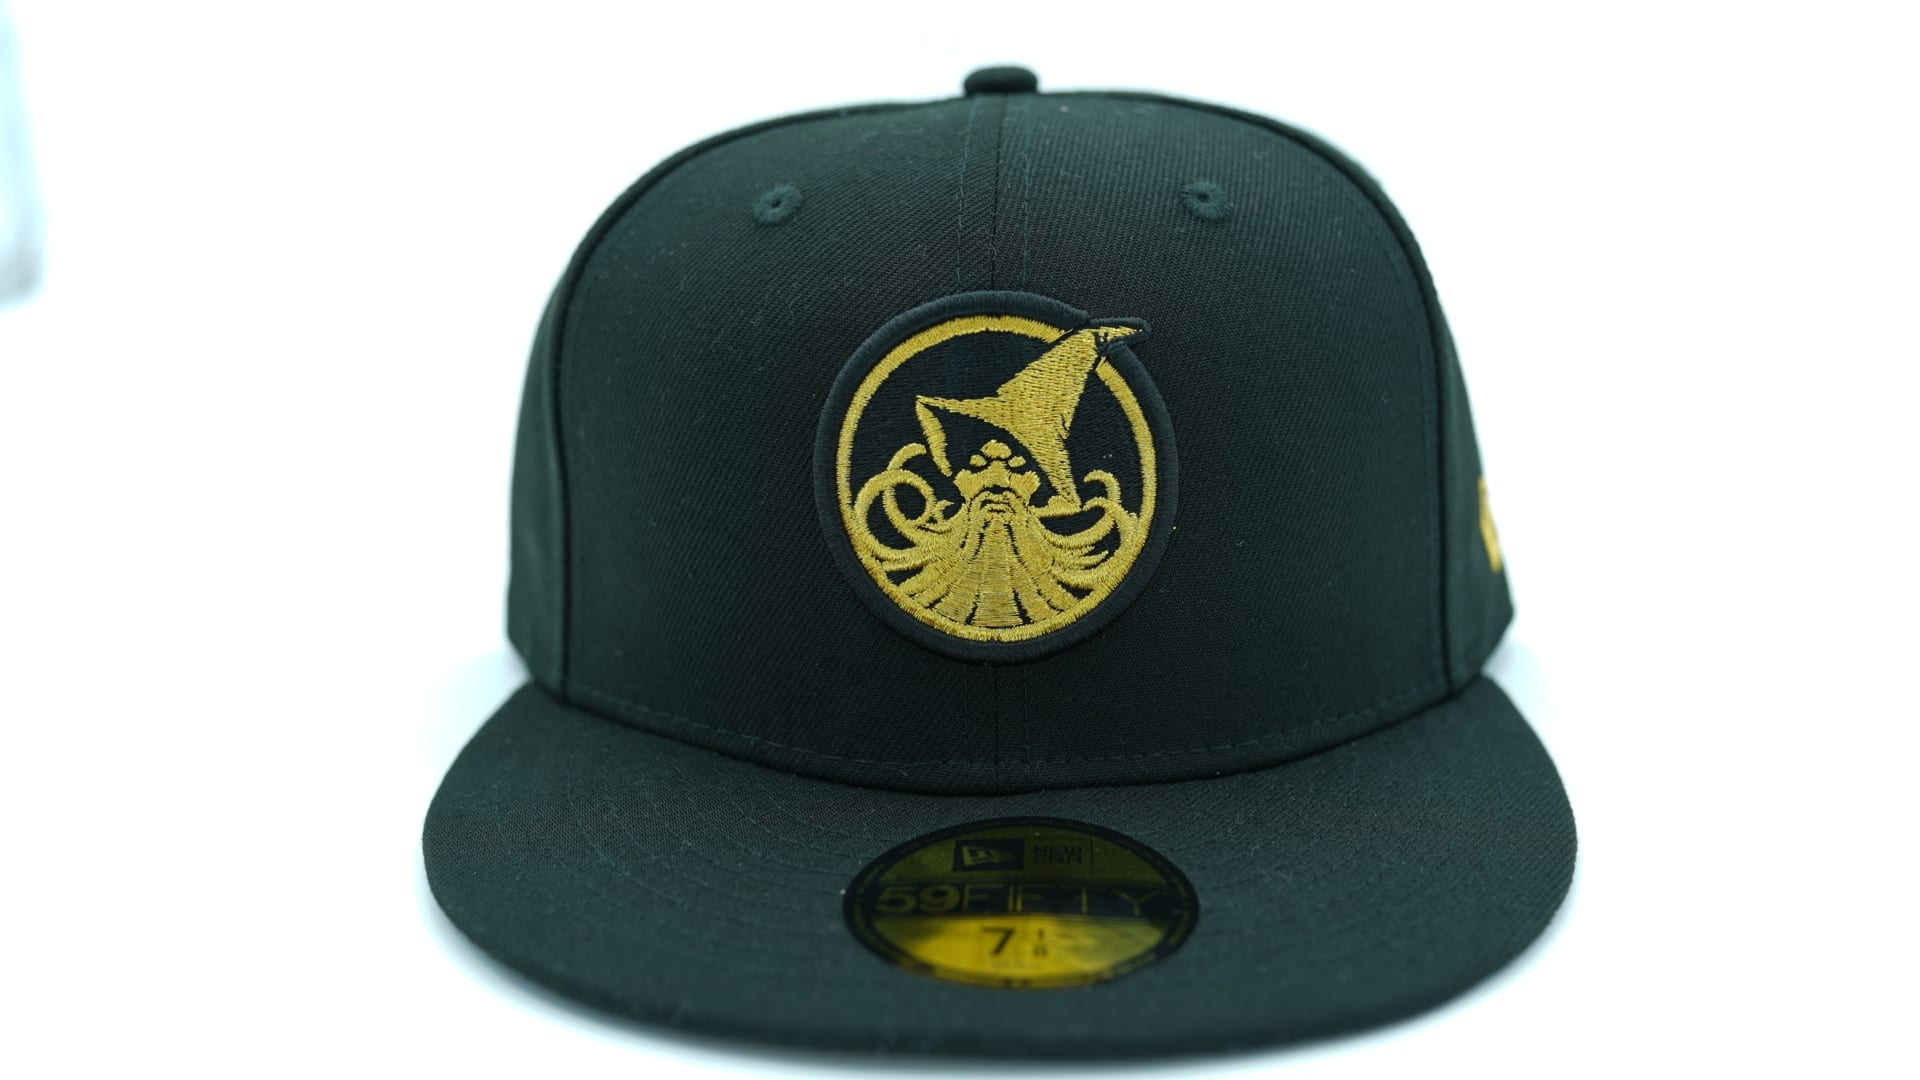 polo-sport-usa-satin-fitted-baseball-cap-hat-ebay